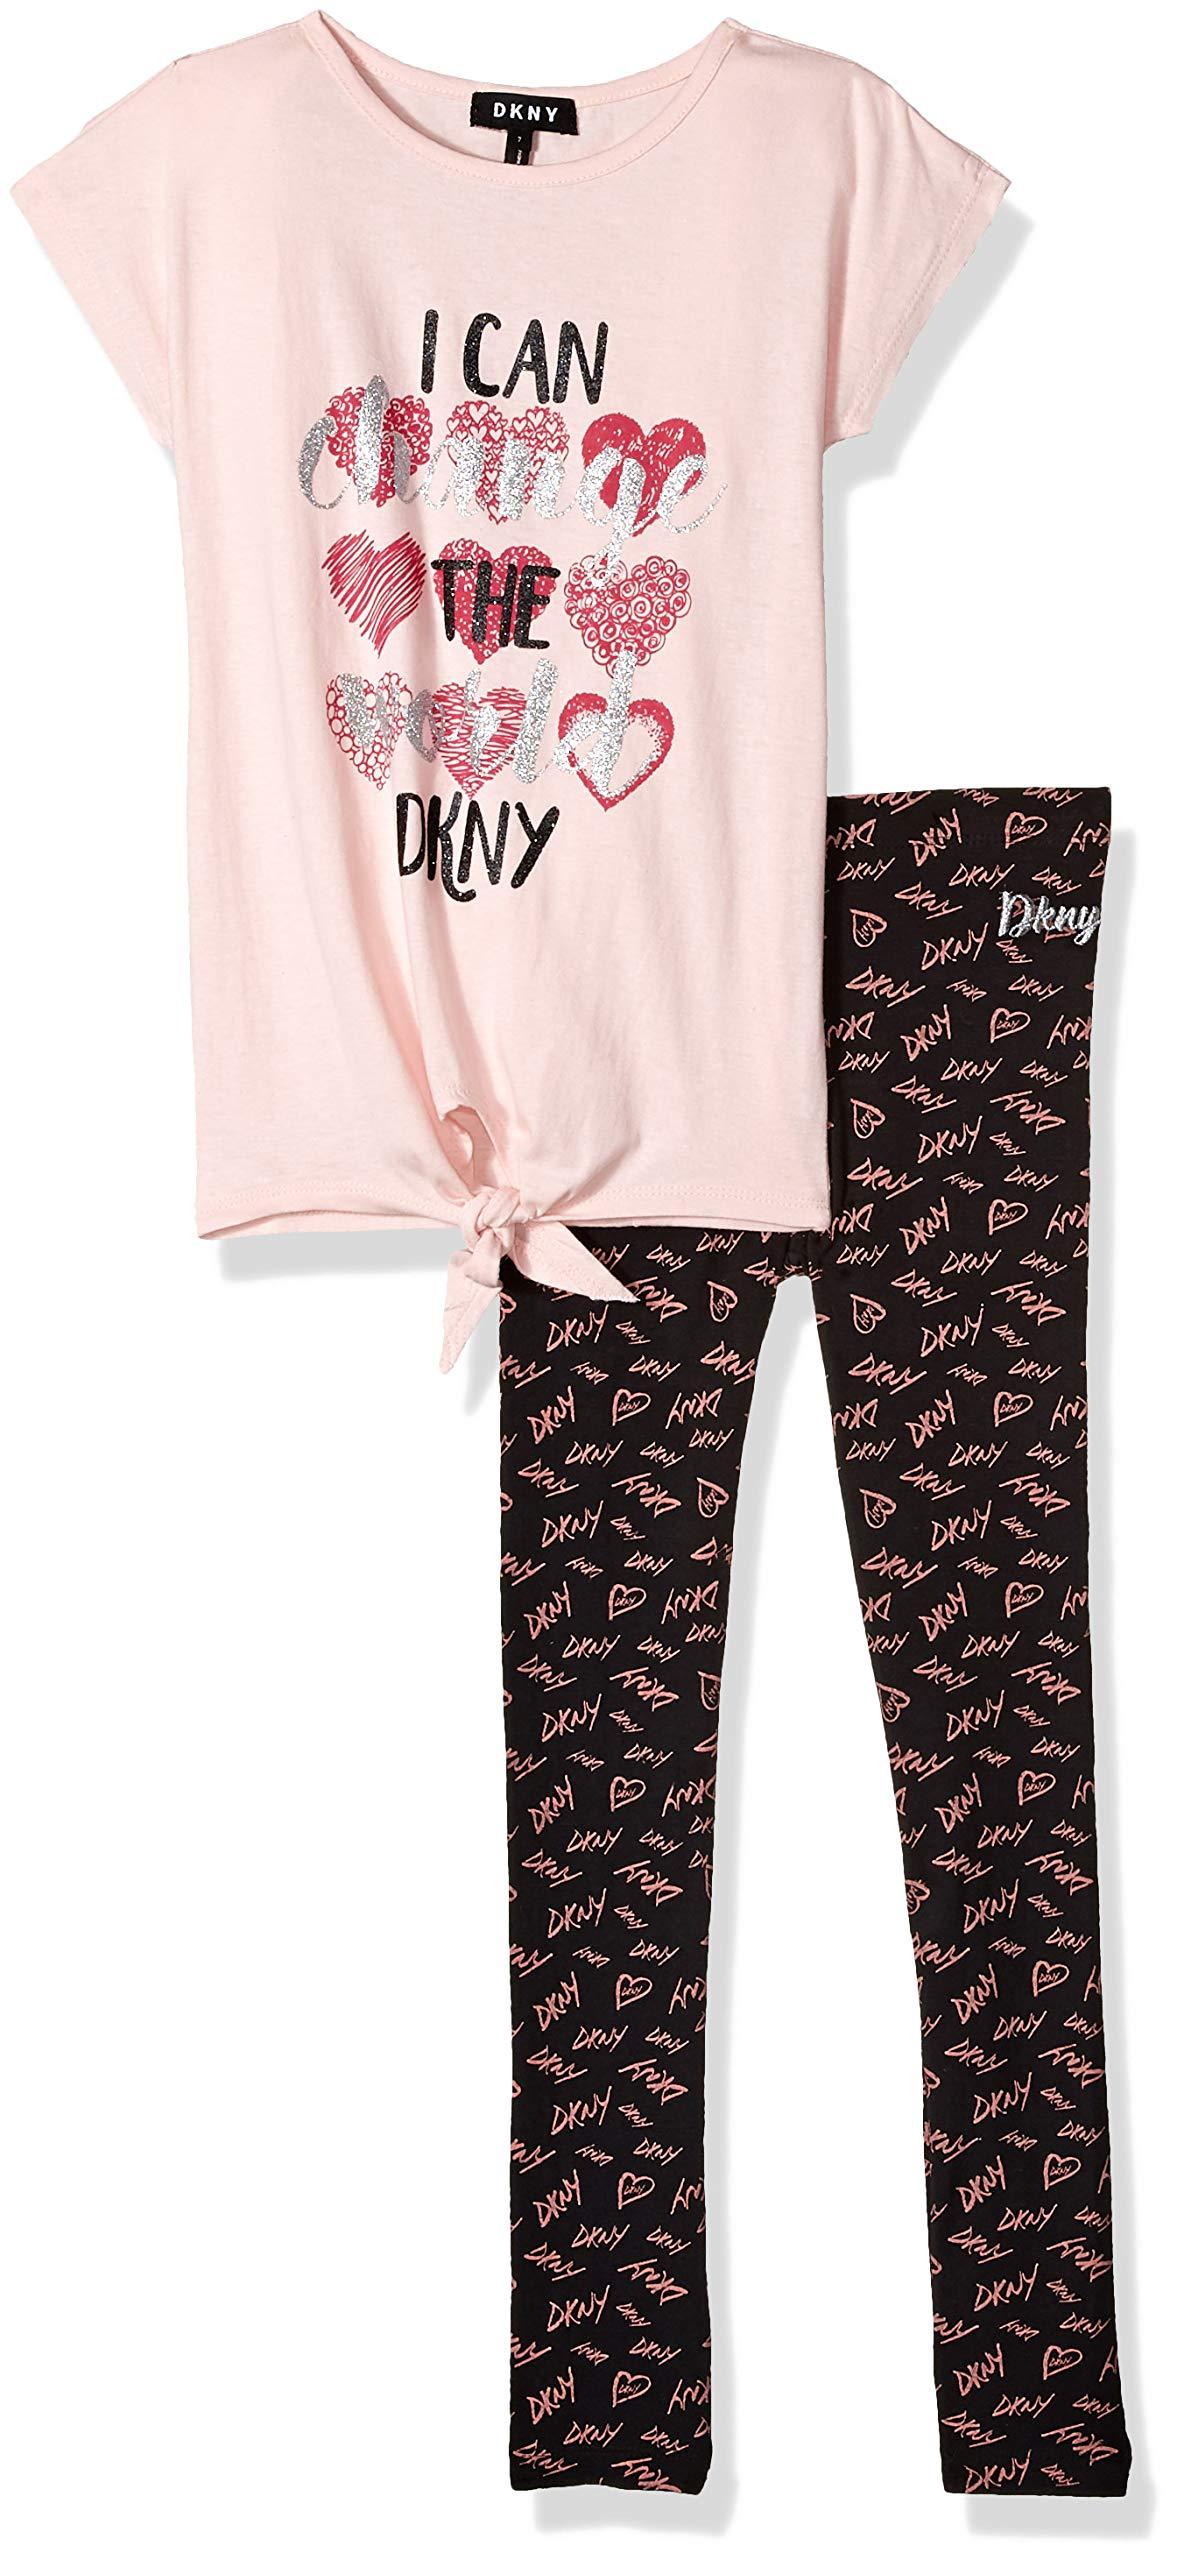 DKNY Girls' Big 2 Piece Change The World T-Shirt and Legging Set, English Rose, 10